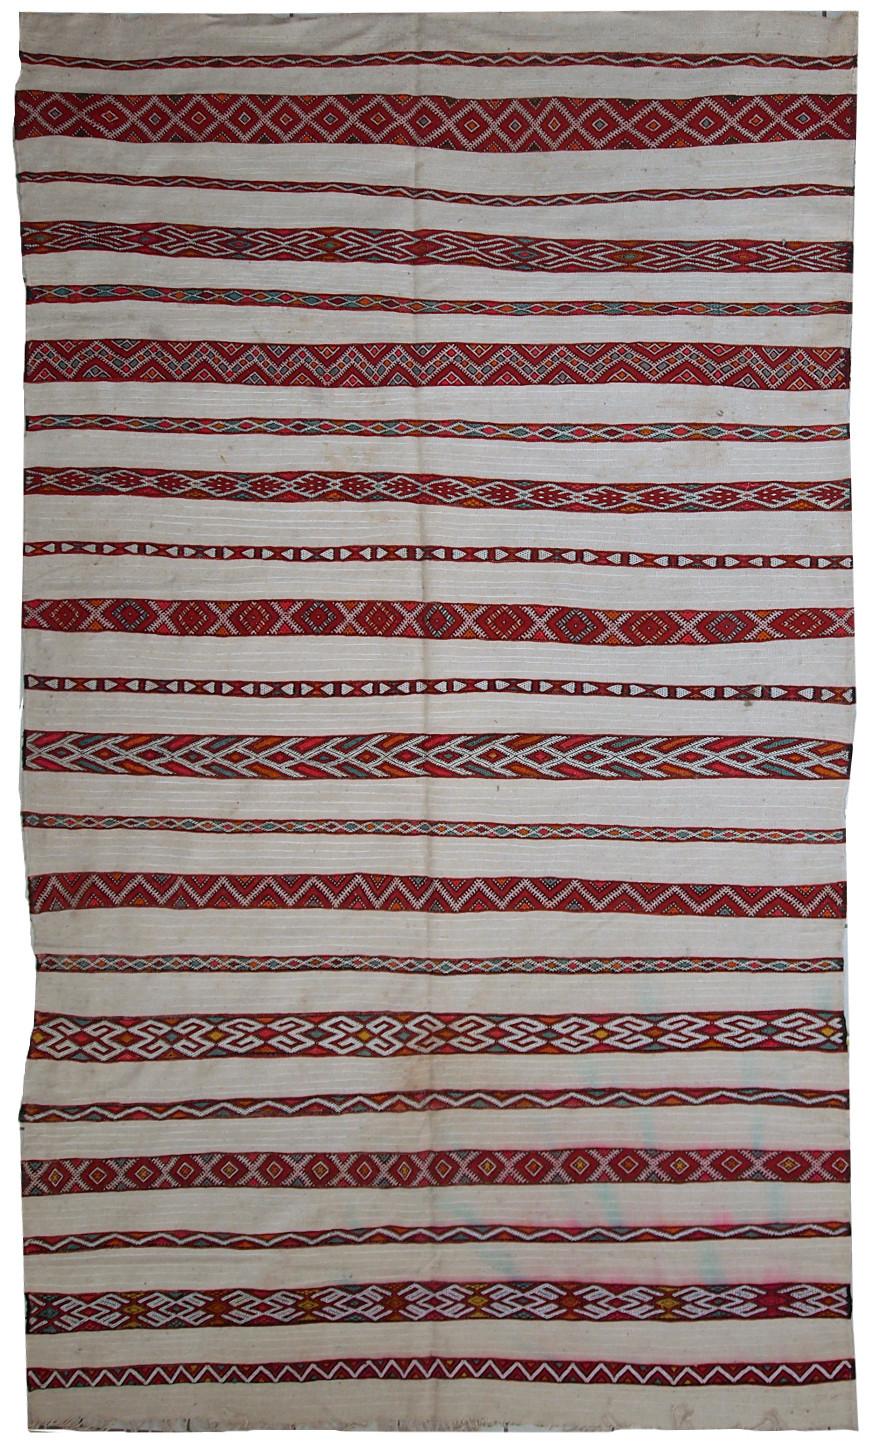 Handmade Vintage Moroccan Kilim Rug